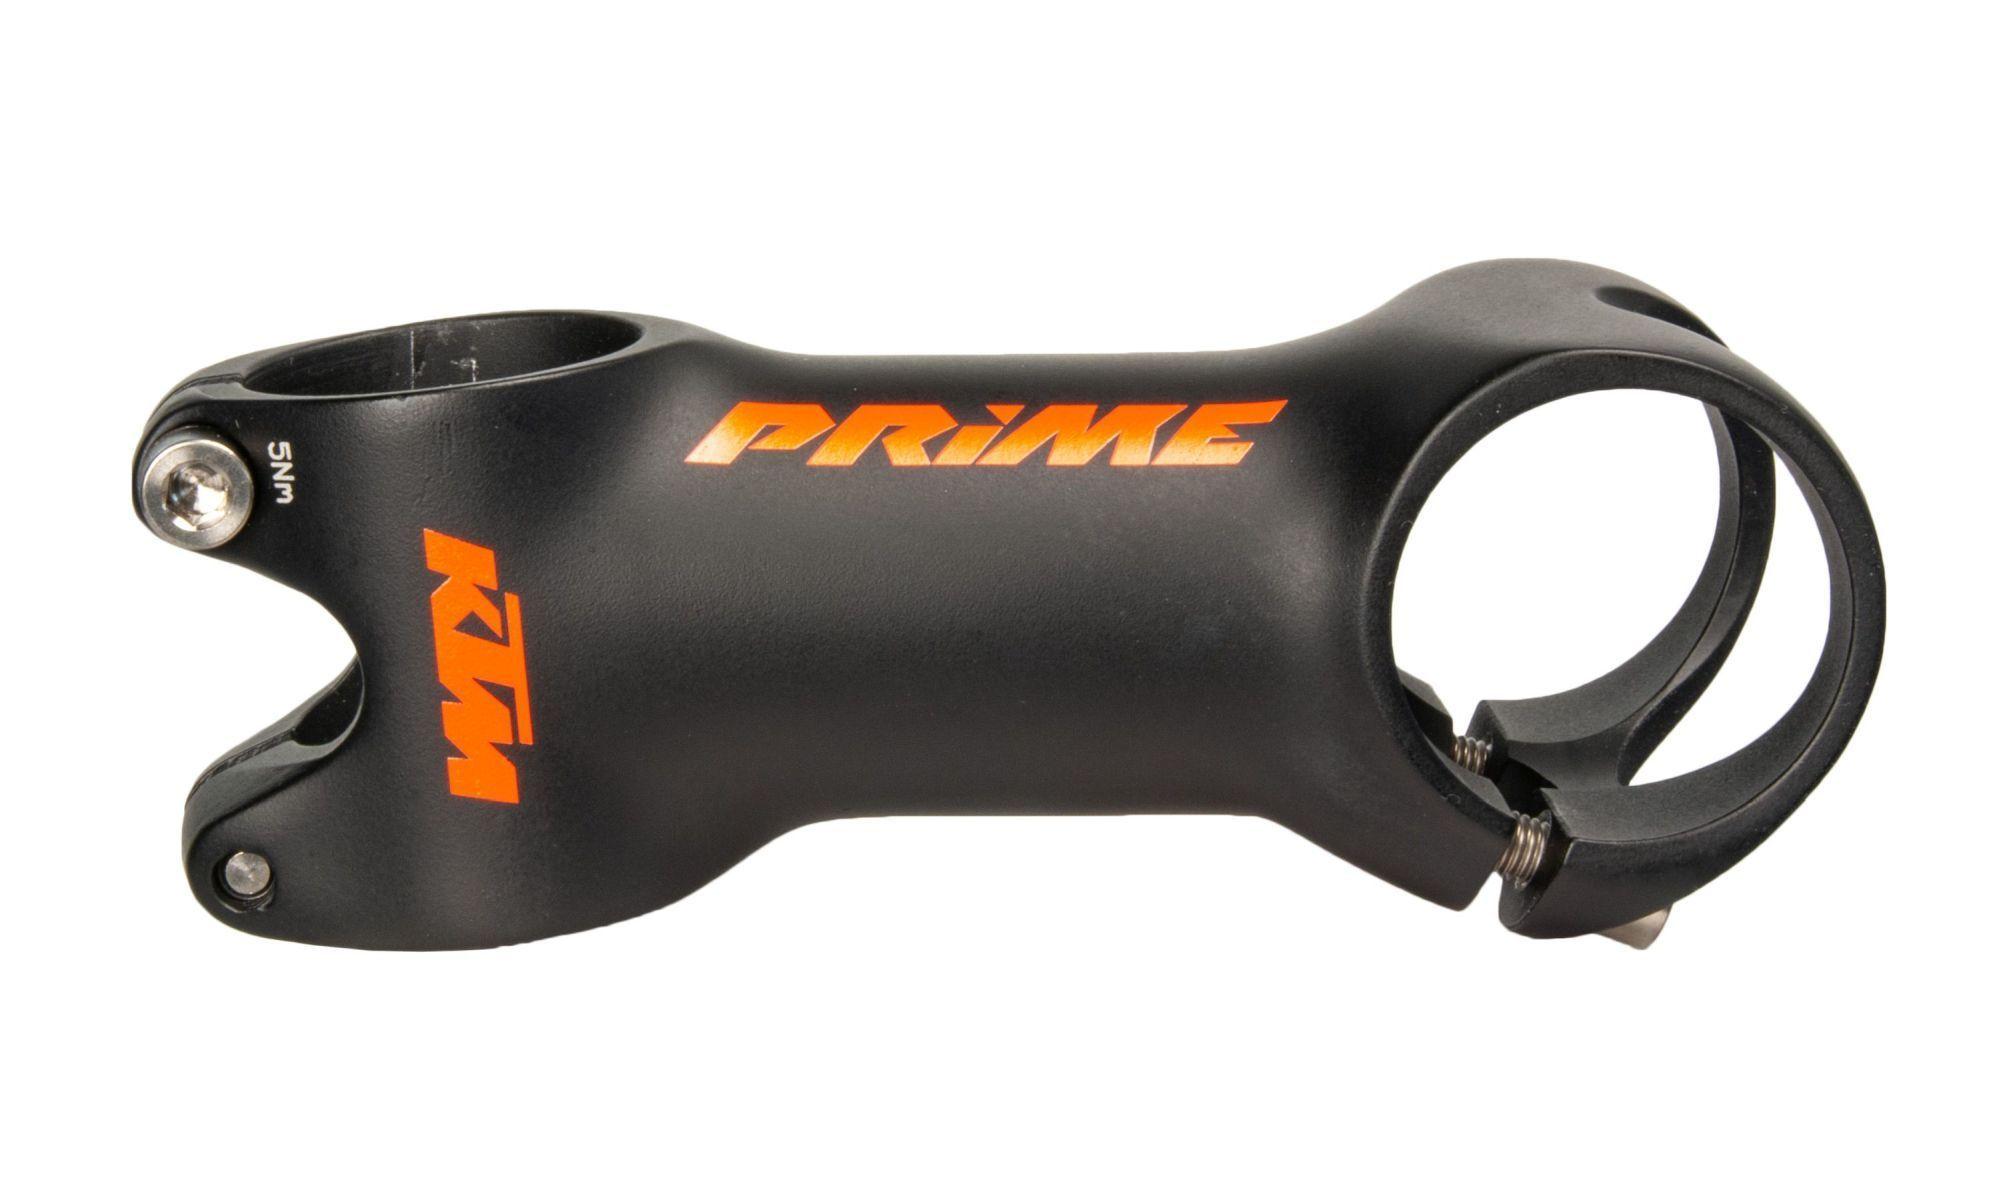 KTM Vorbau Prime Clean Shape 6 (6°/90mm)